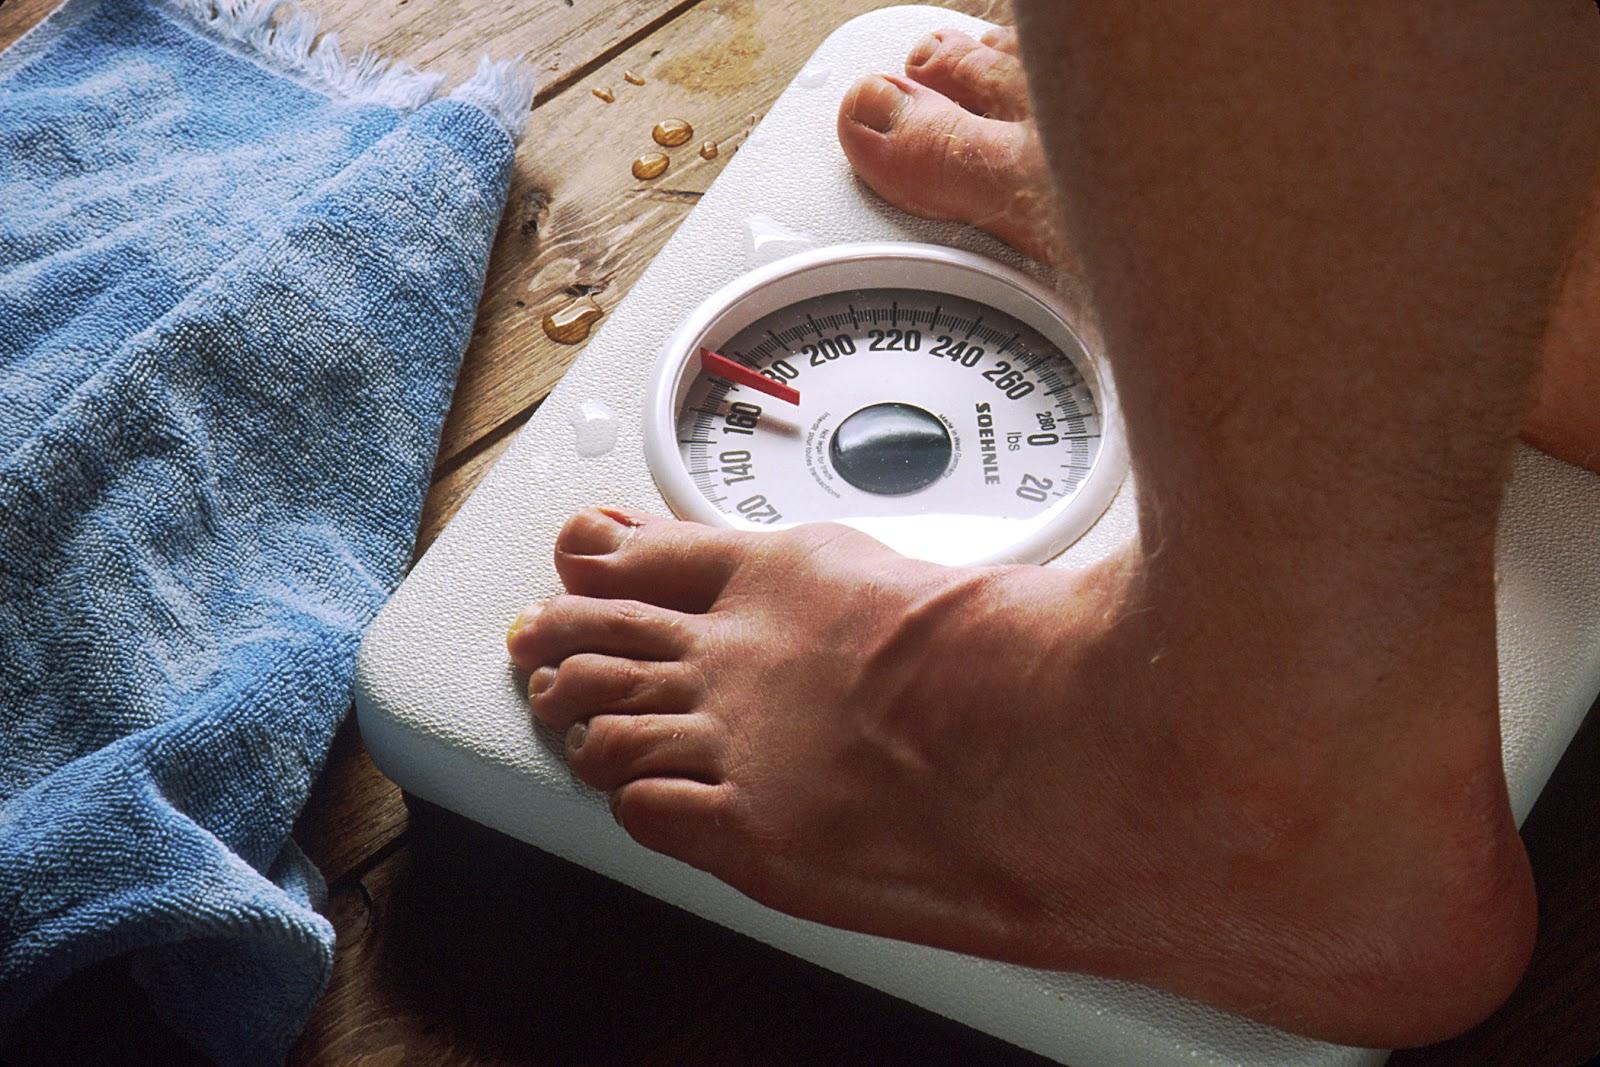 Feet_on_scale.jpg